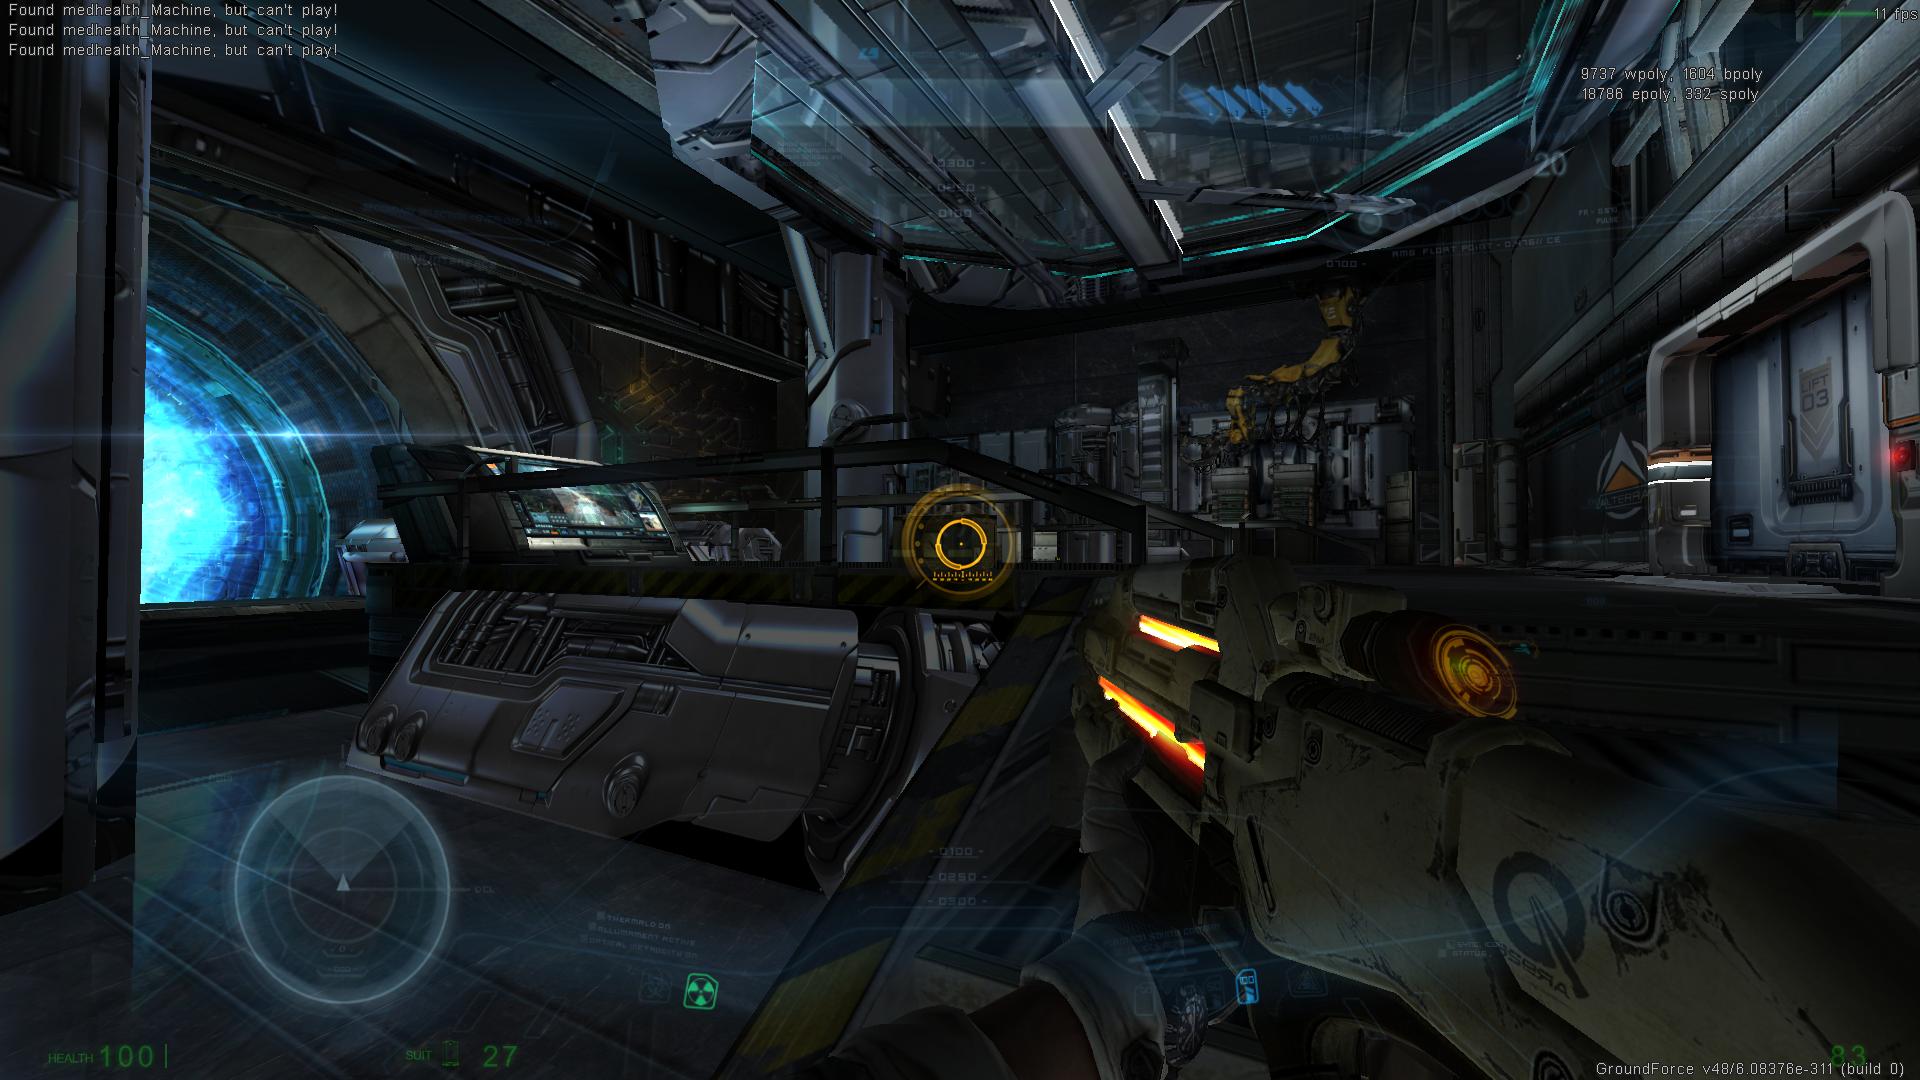 ew_teleportation_docking_0014